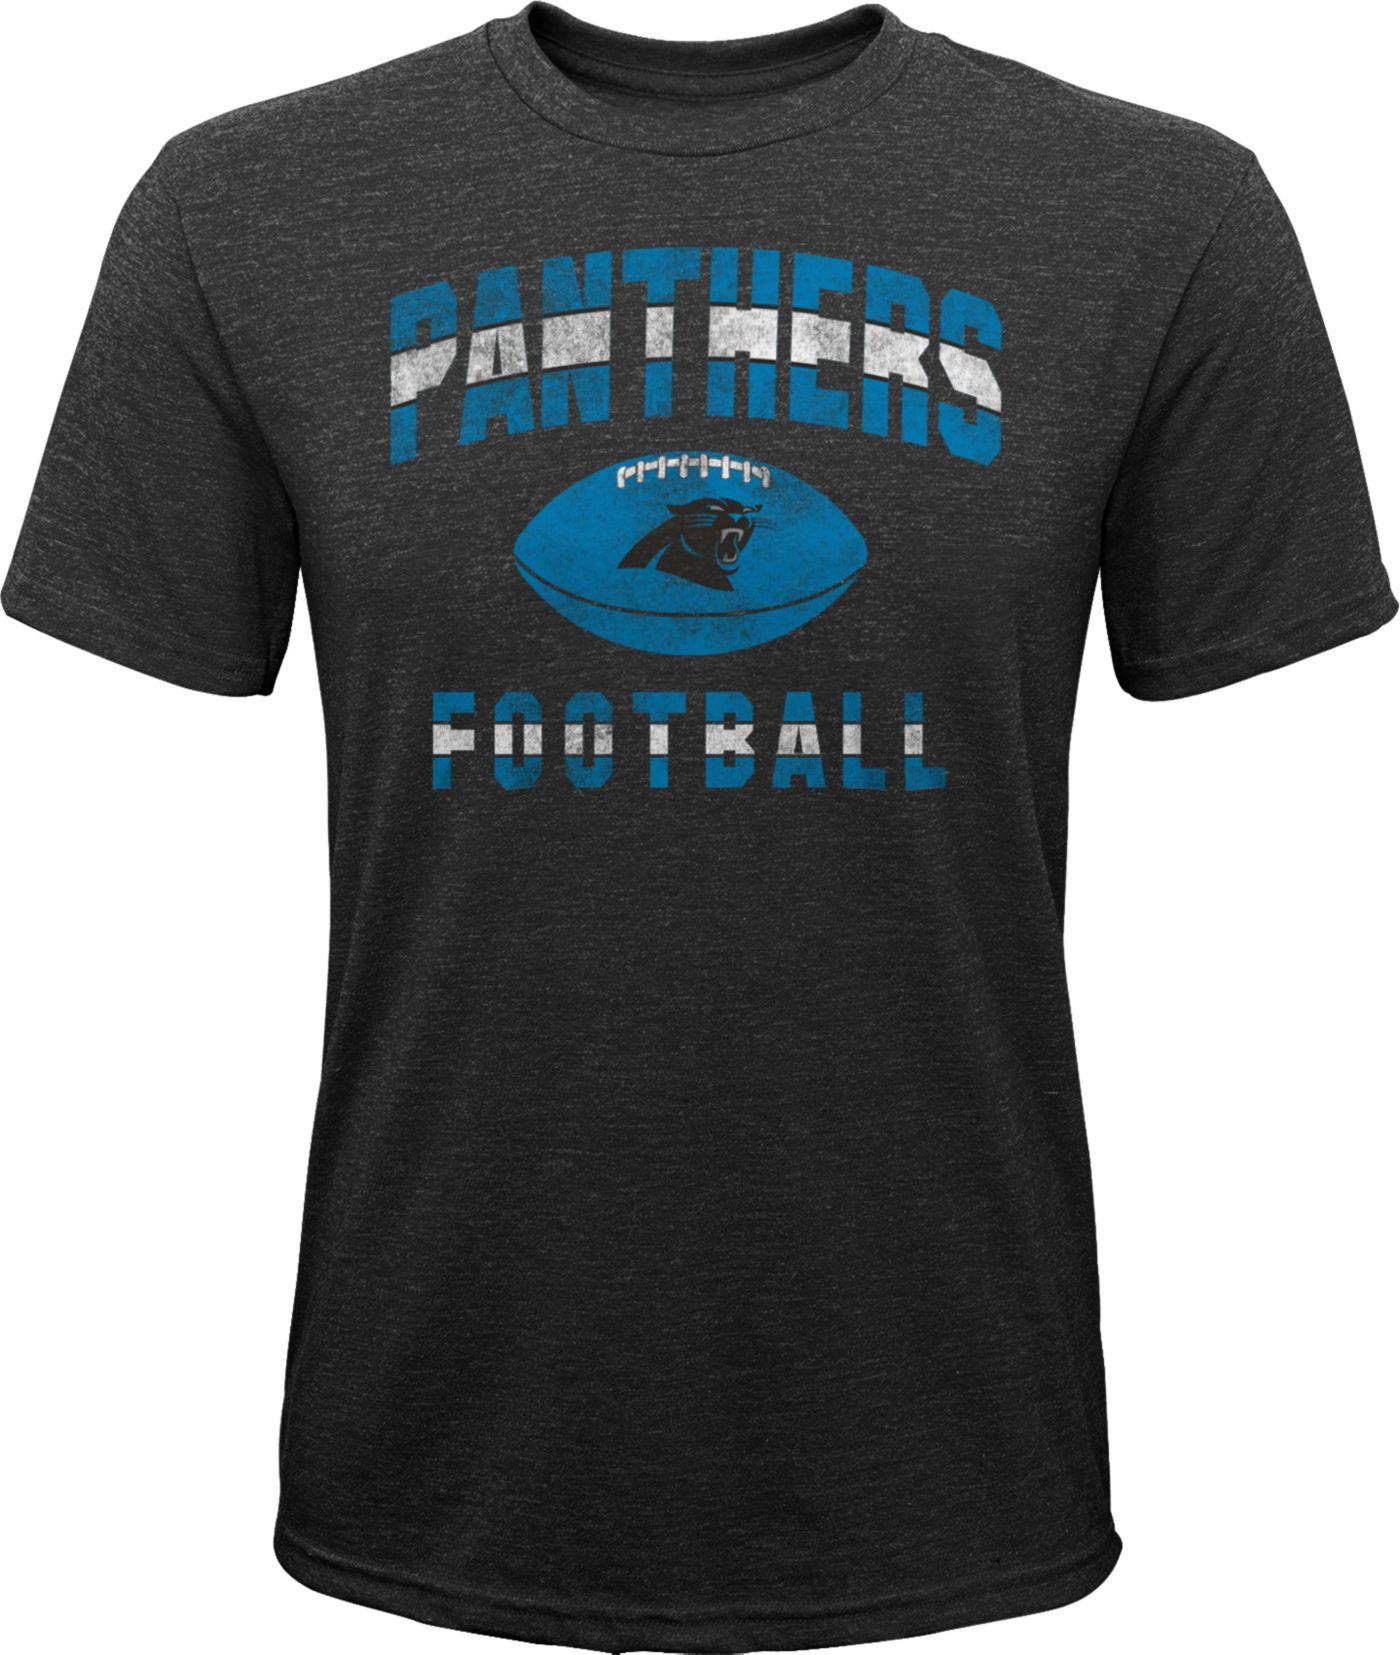 NFL Team Apparel Youth Carolina Panthers Big Game Tri-Blend Black T-Shirt